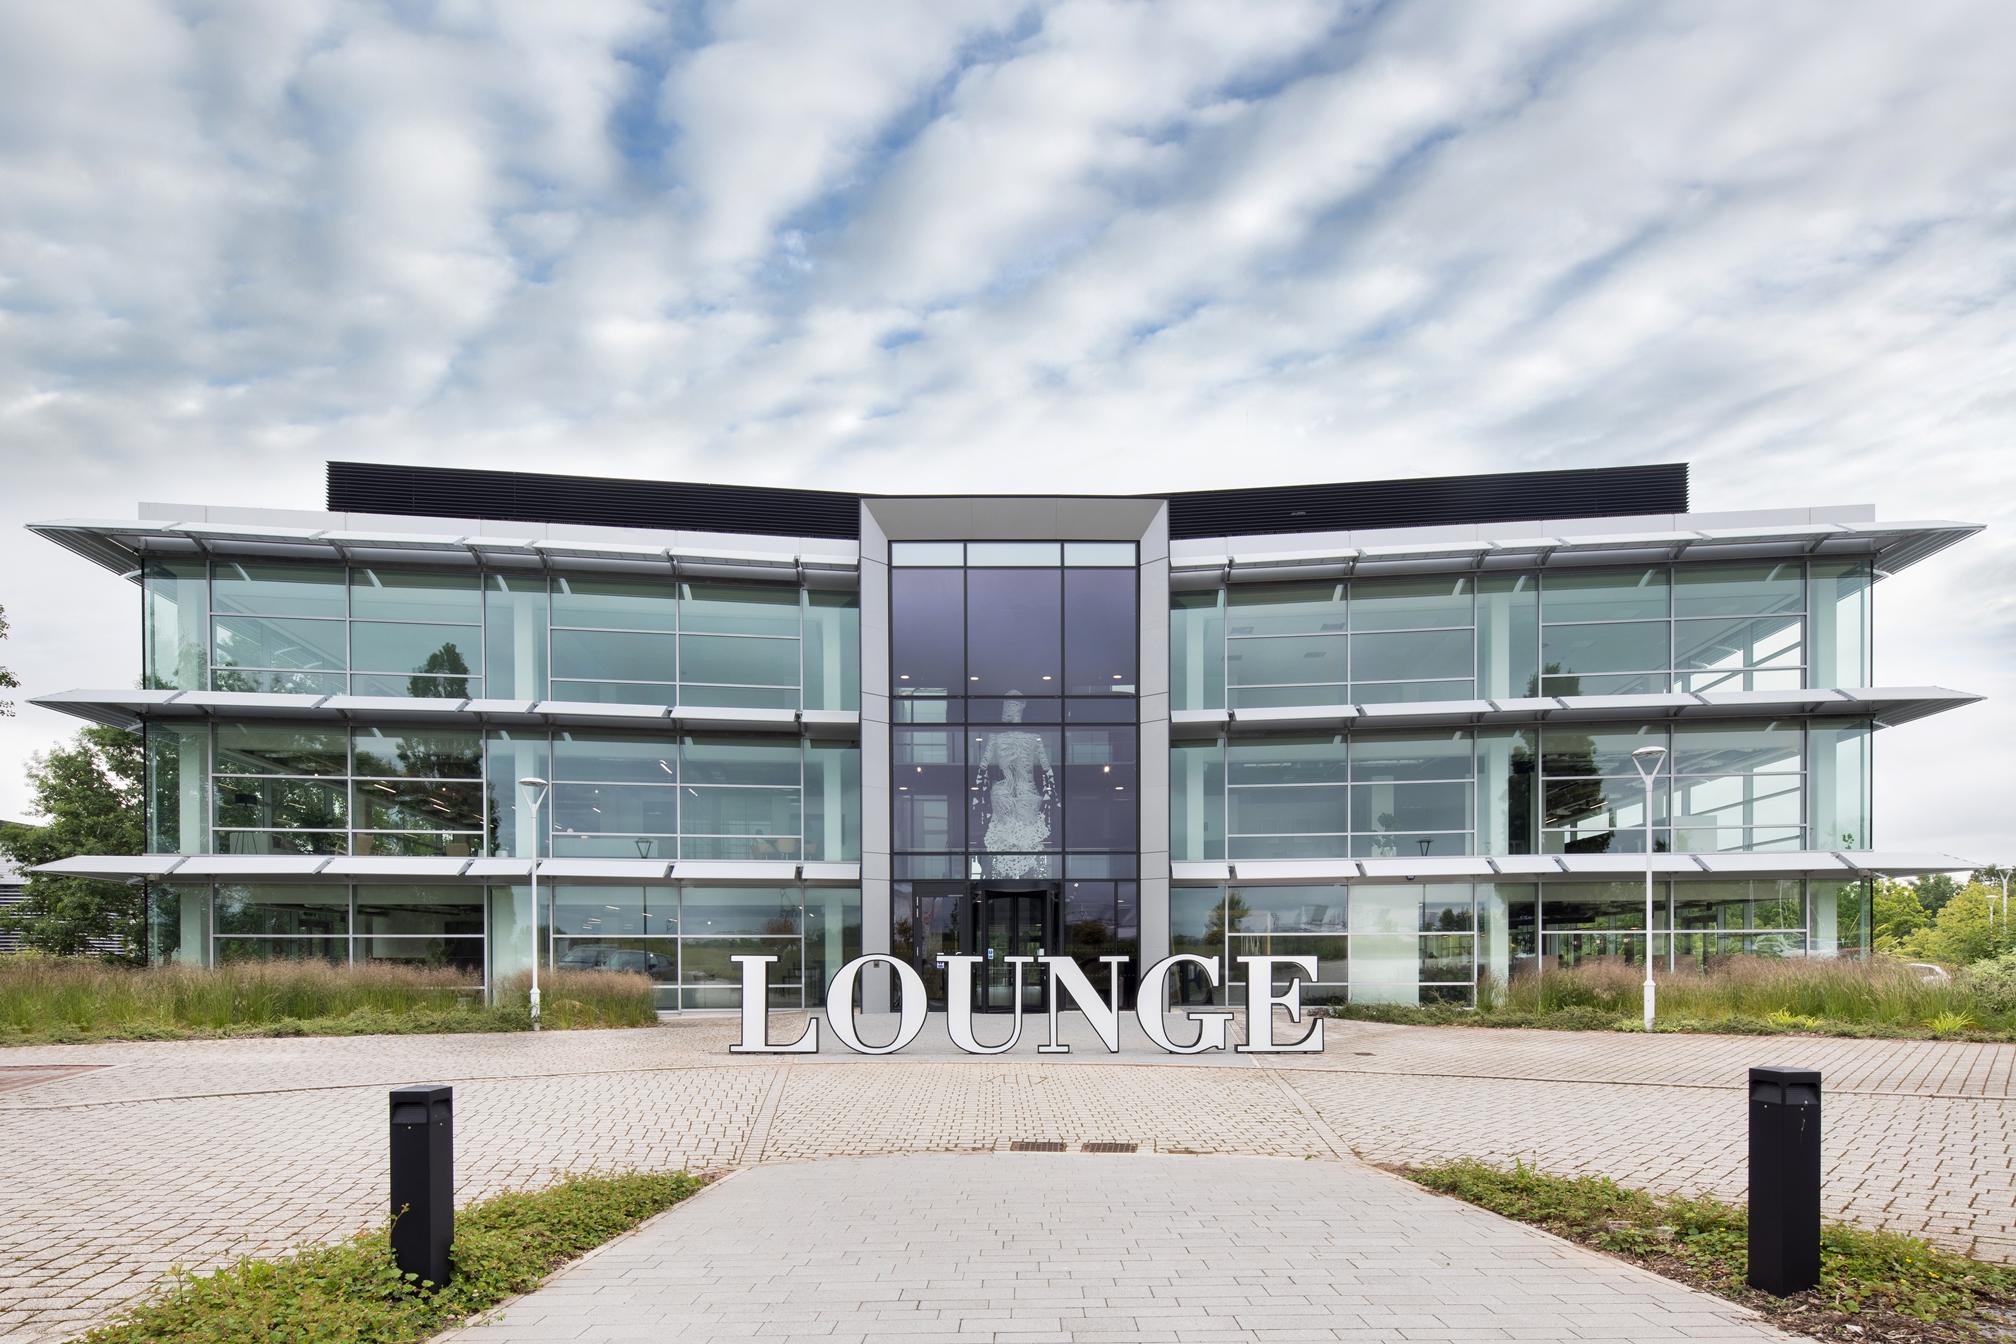 Lounge HQ front elevation